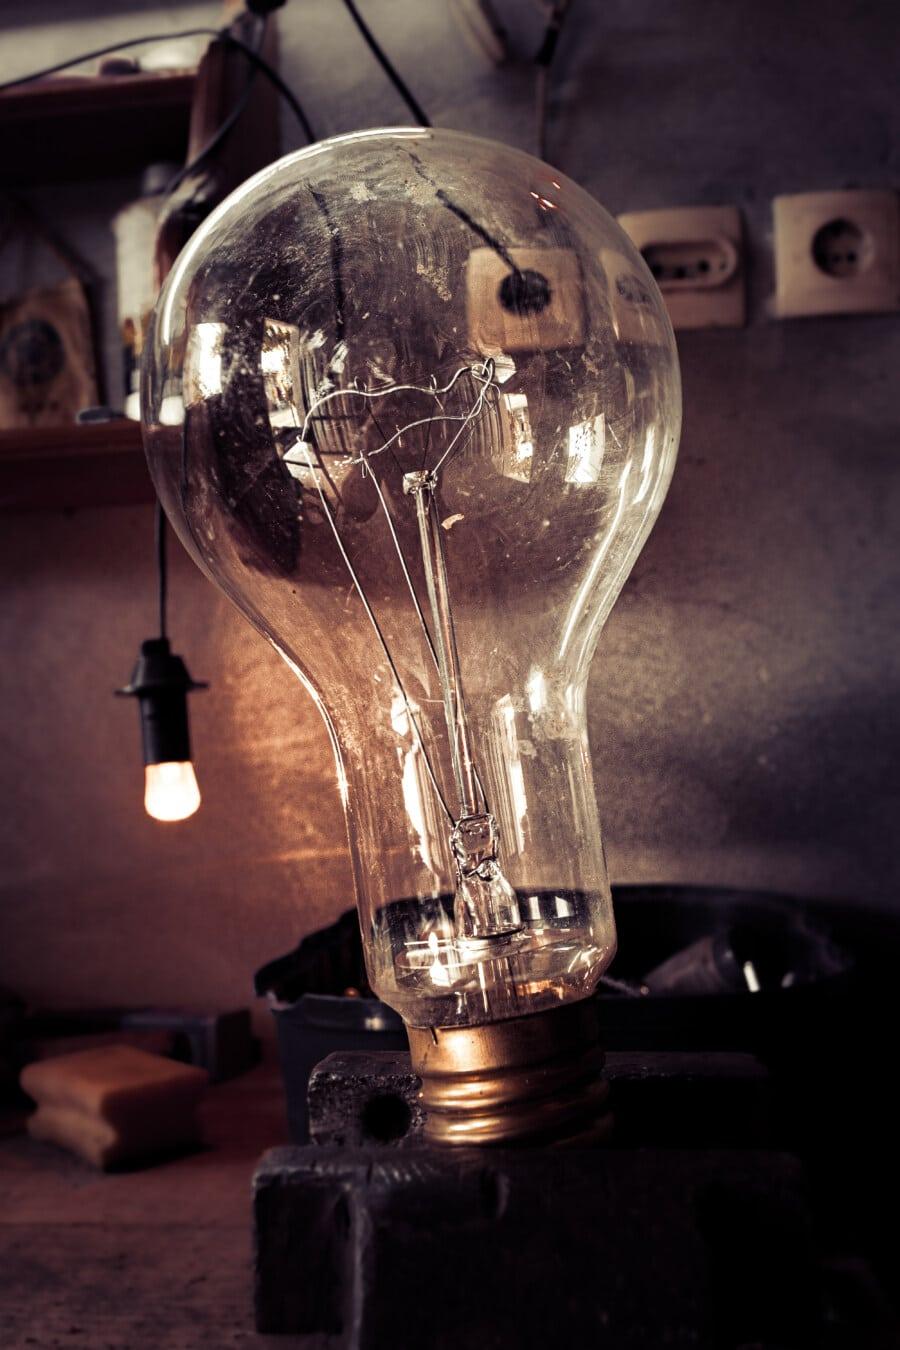 light bulb, workshop, repair shop, electronic, close-up, electricity, lamp, light, bulb, glass